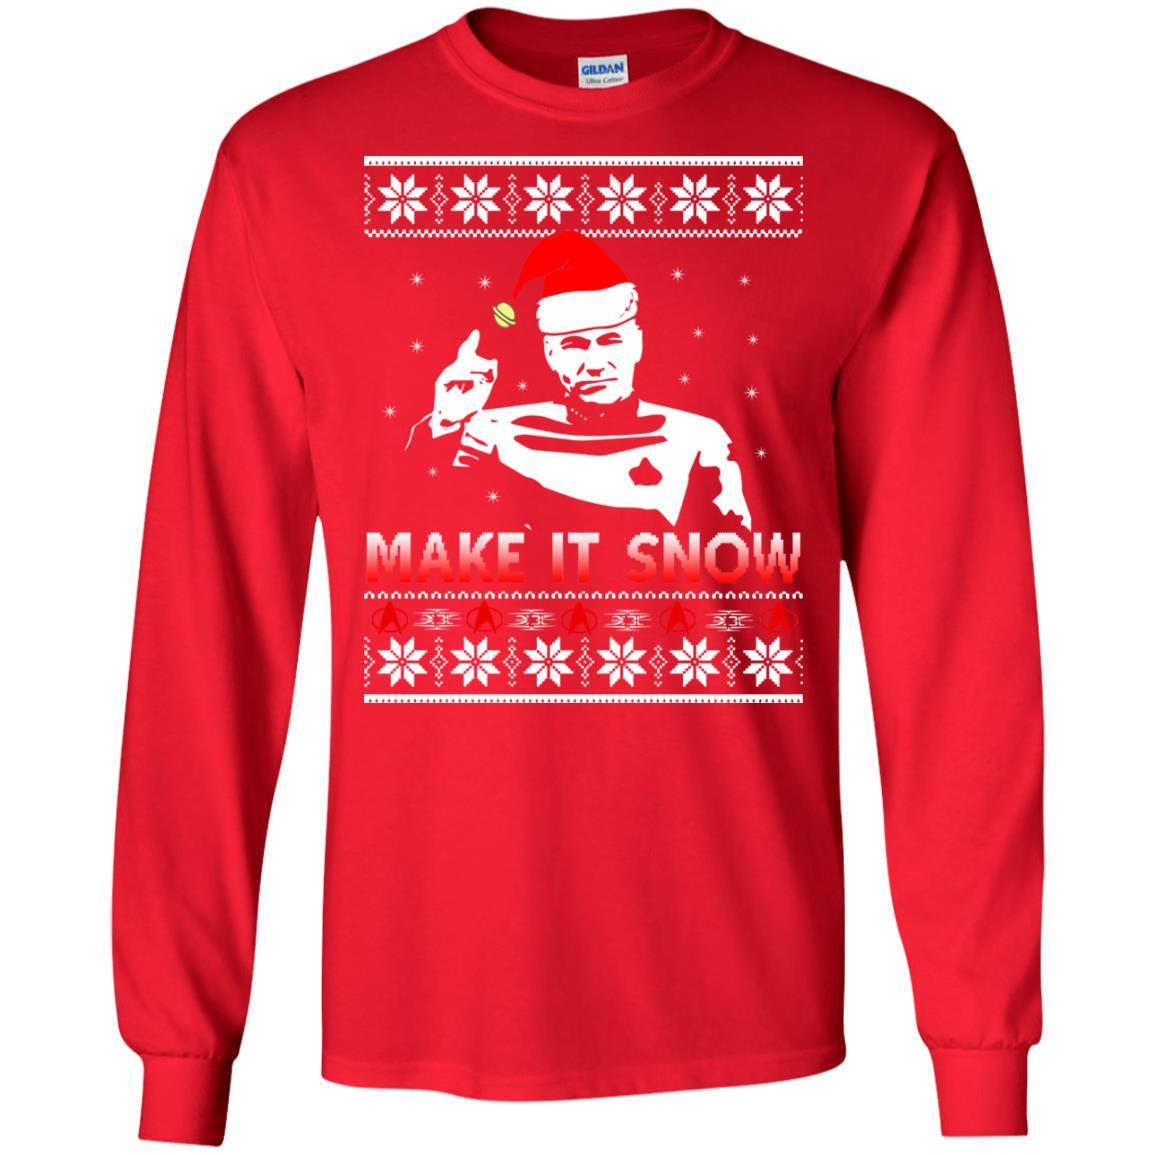 image 2409 - Star Trek make it snow Christmas Sweater, Shirt